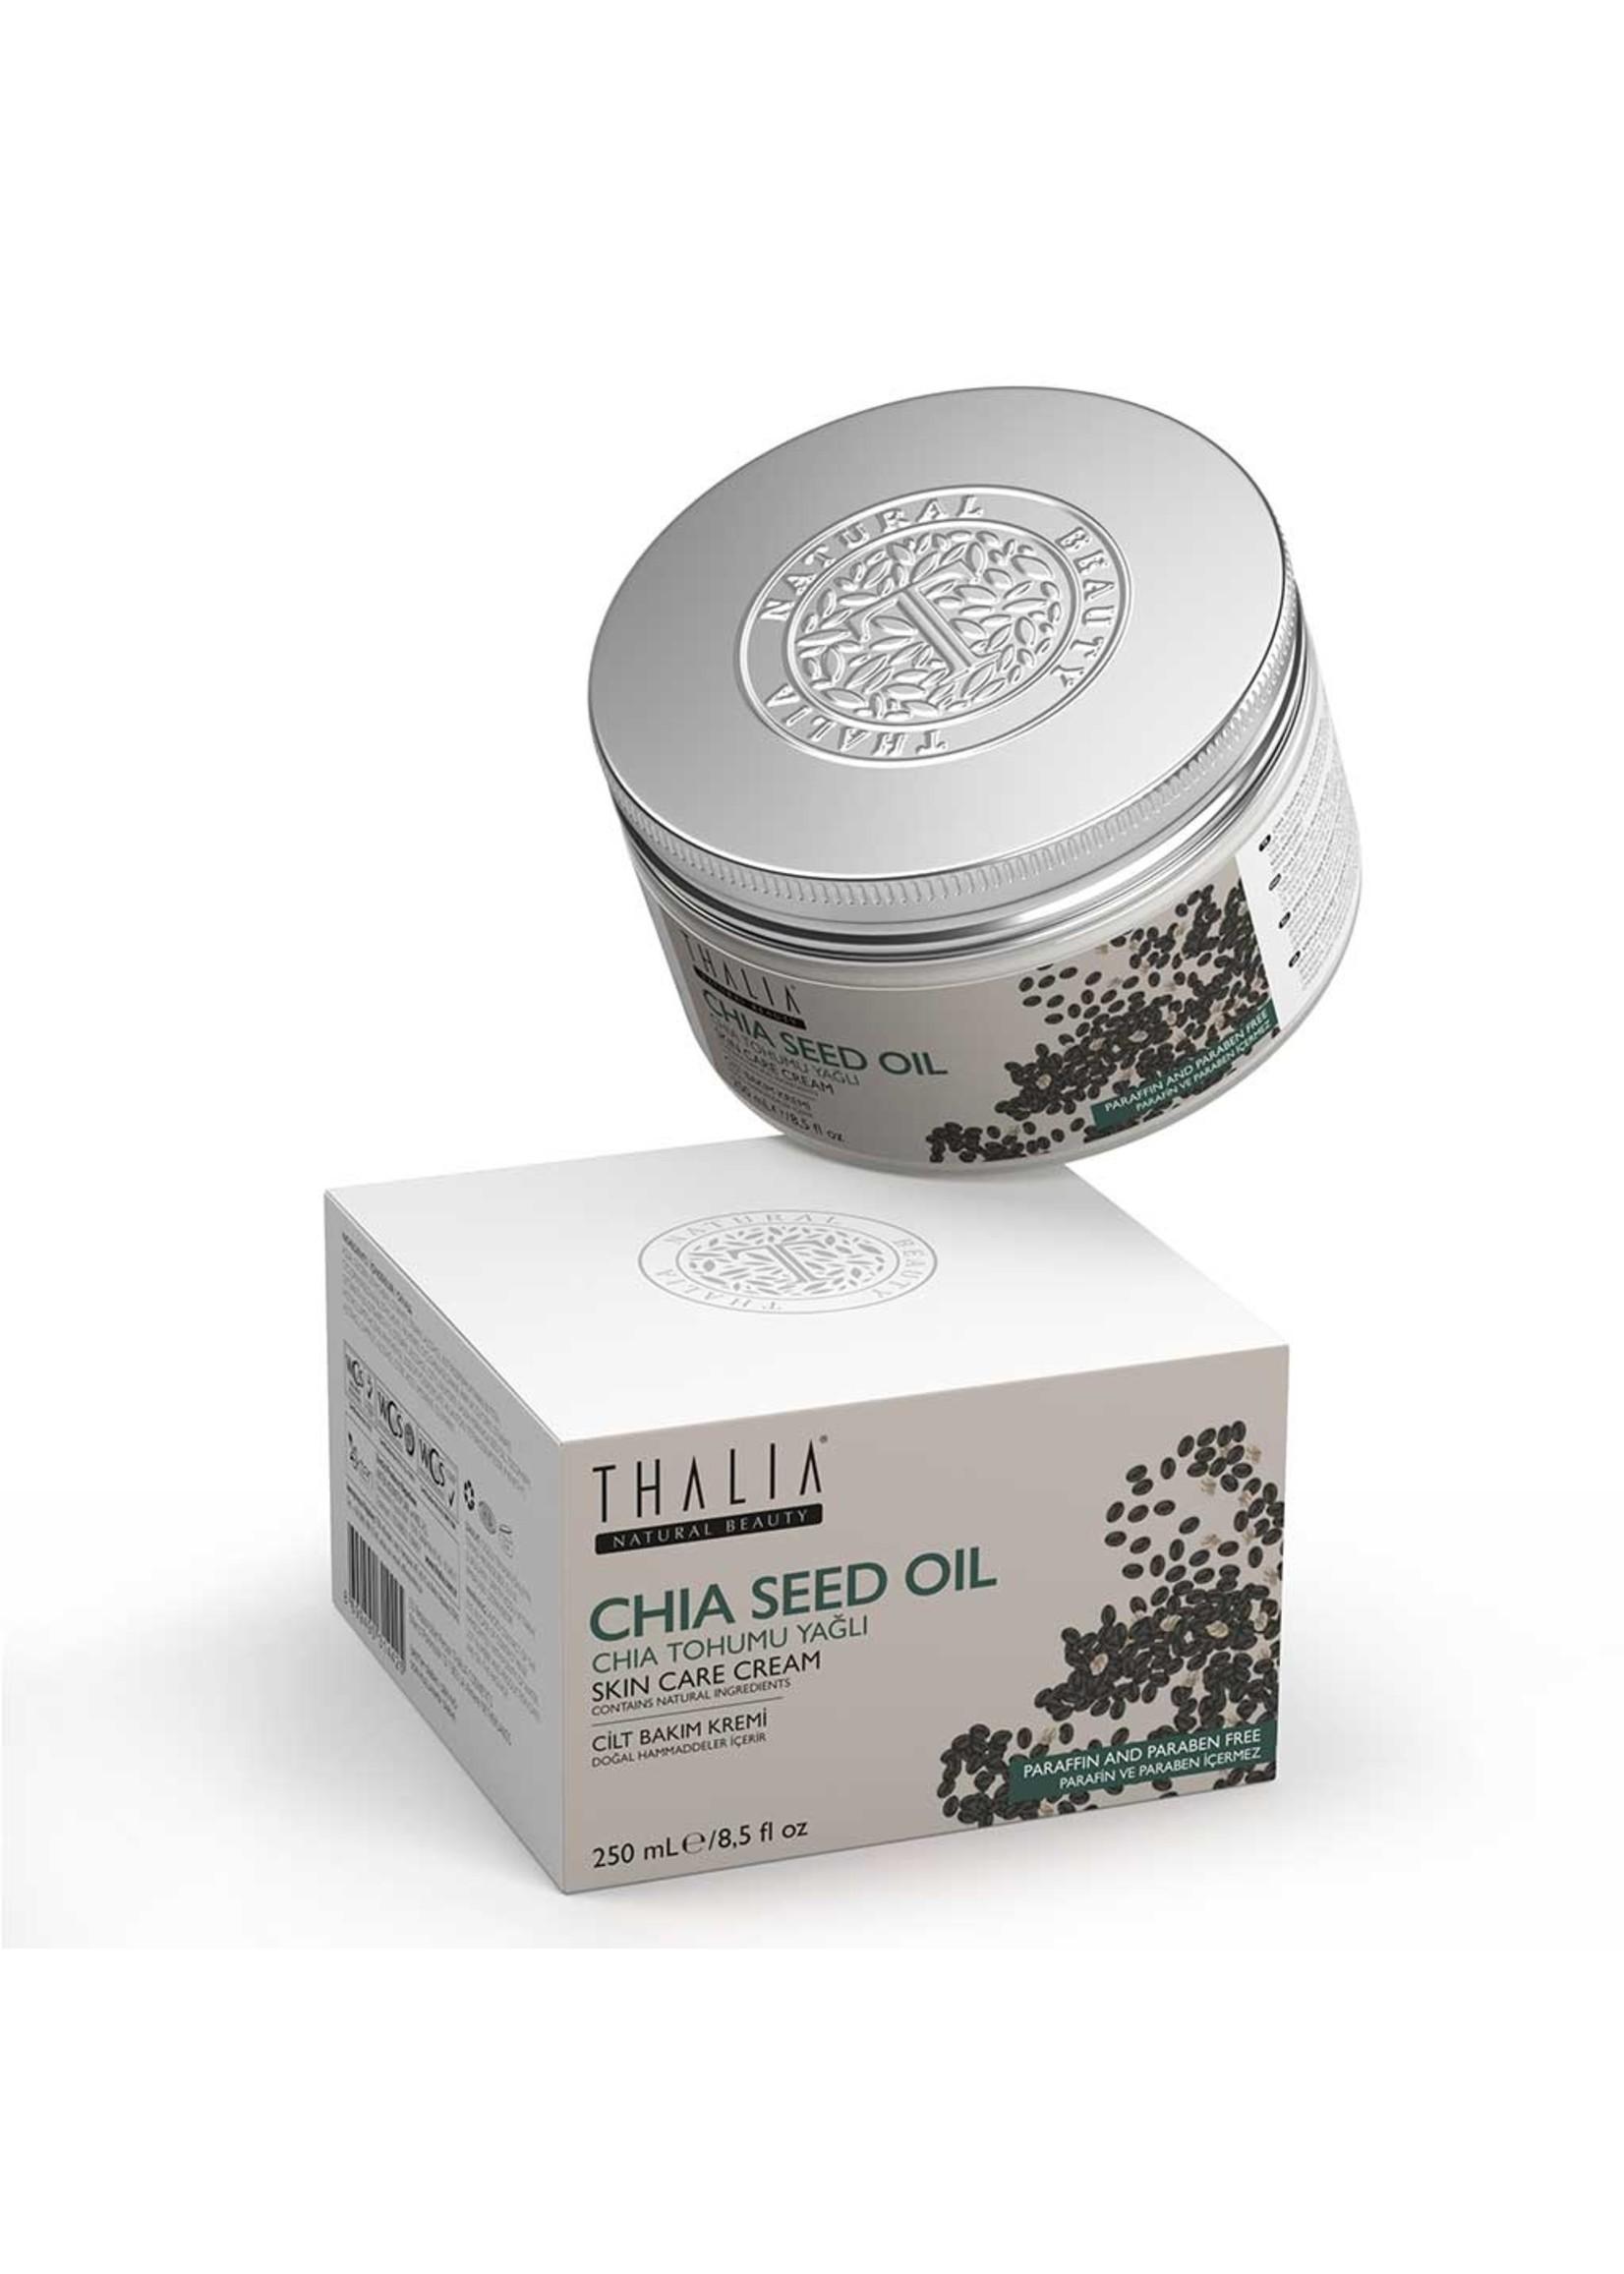 Thalia Chia Zaadolie Skin Care Cream - 250 ml